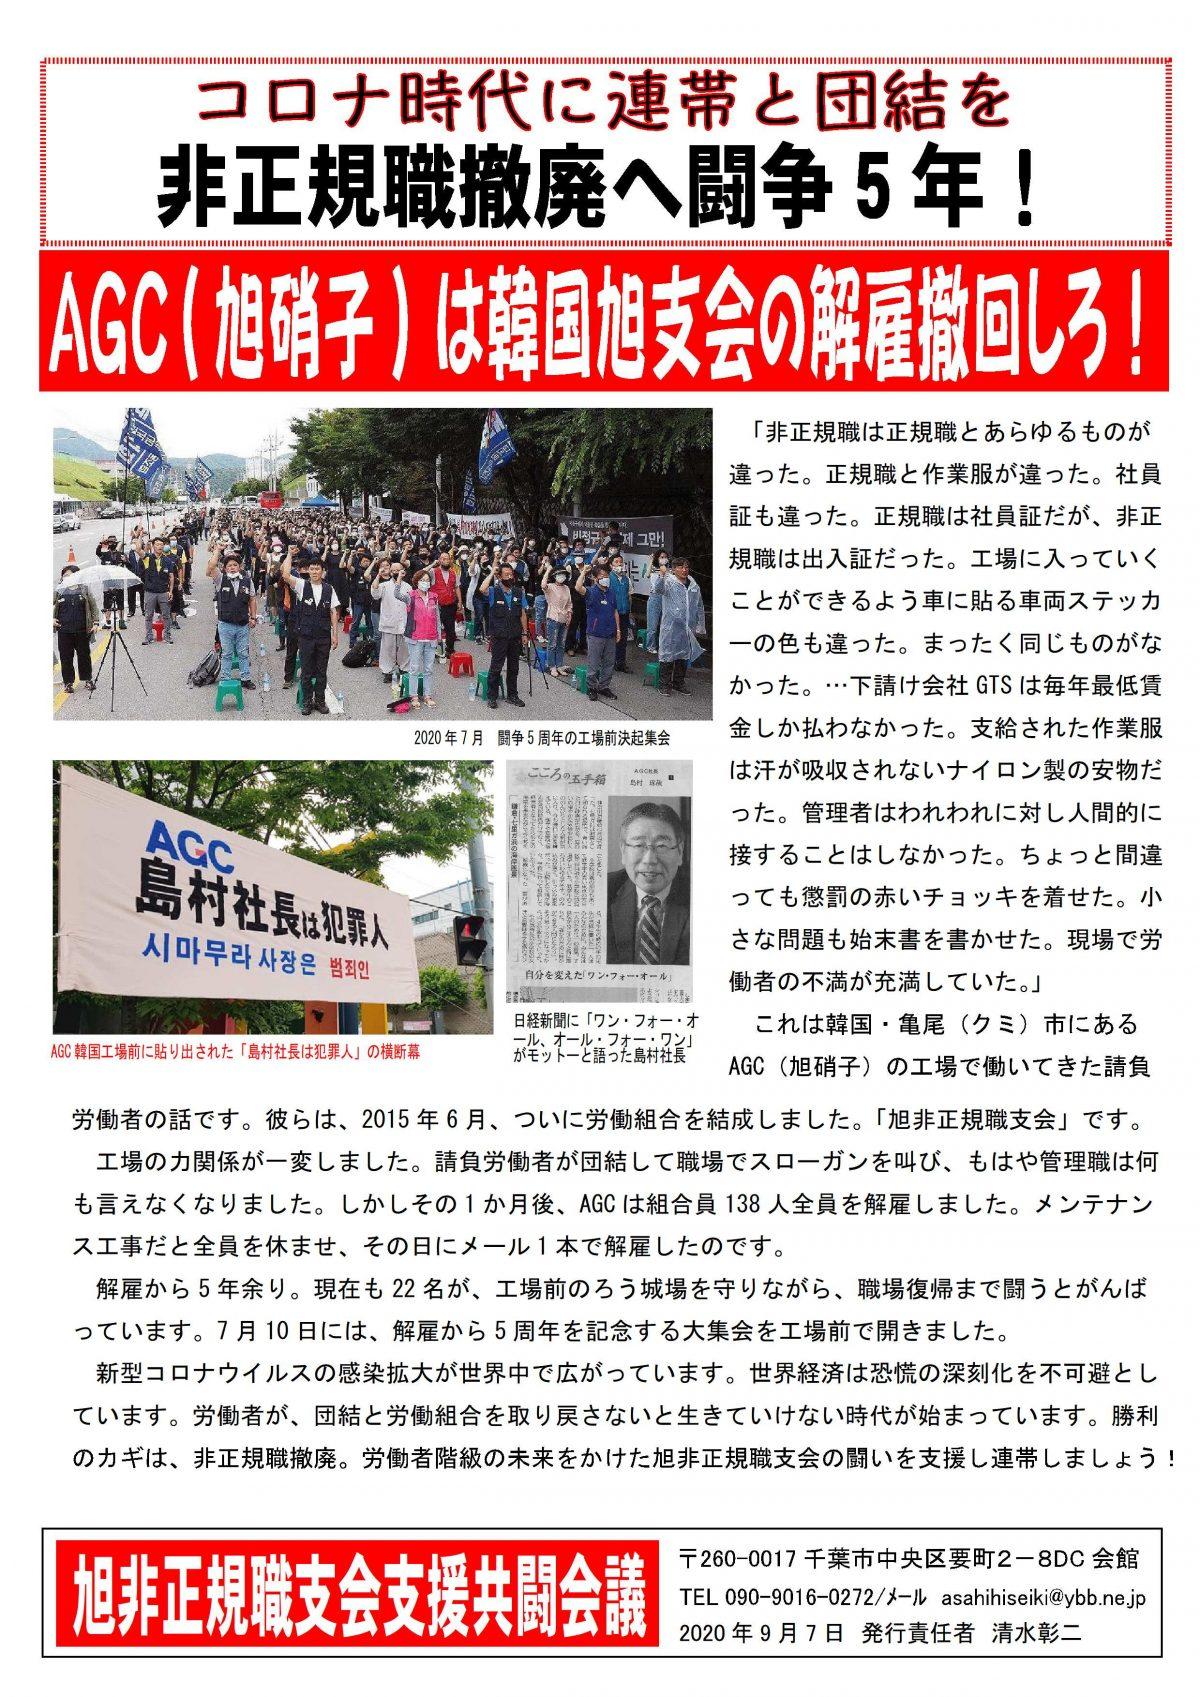 活動再開!9月11日AGC本社前へ!